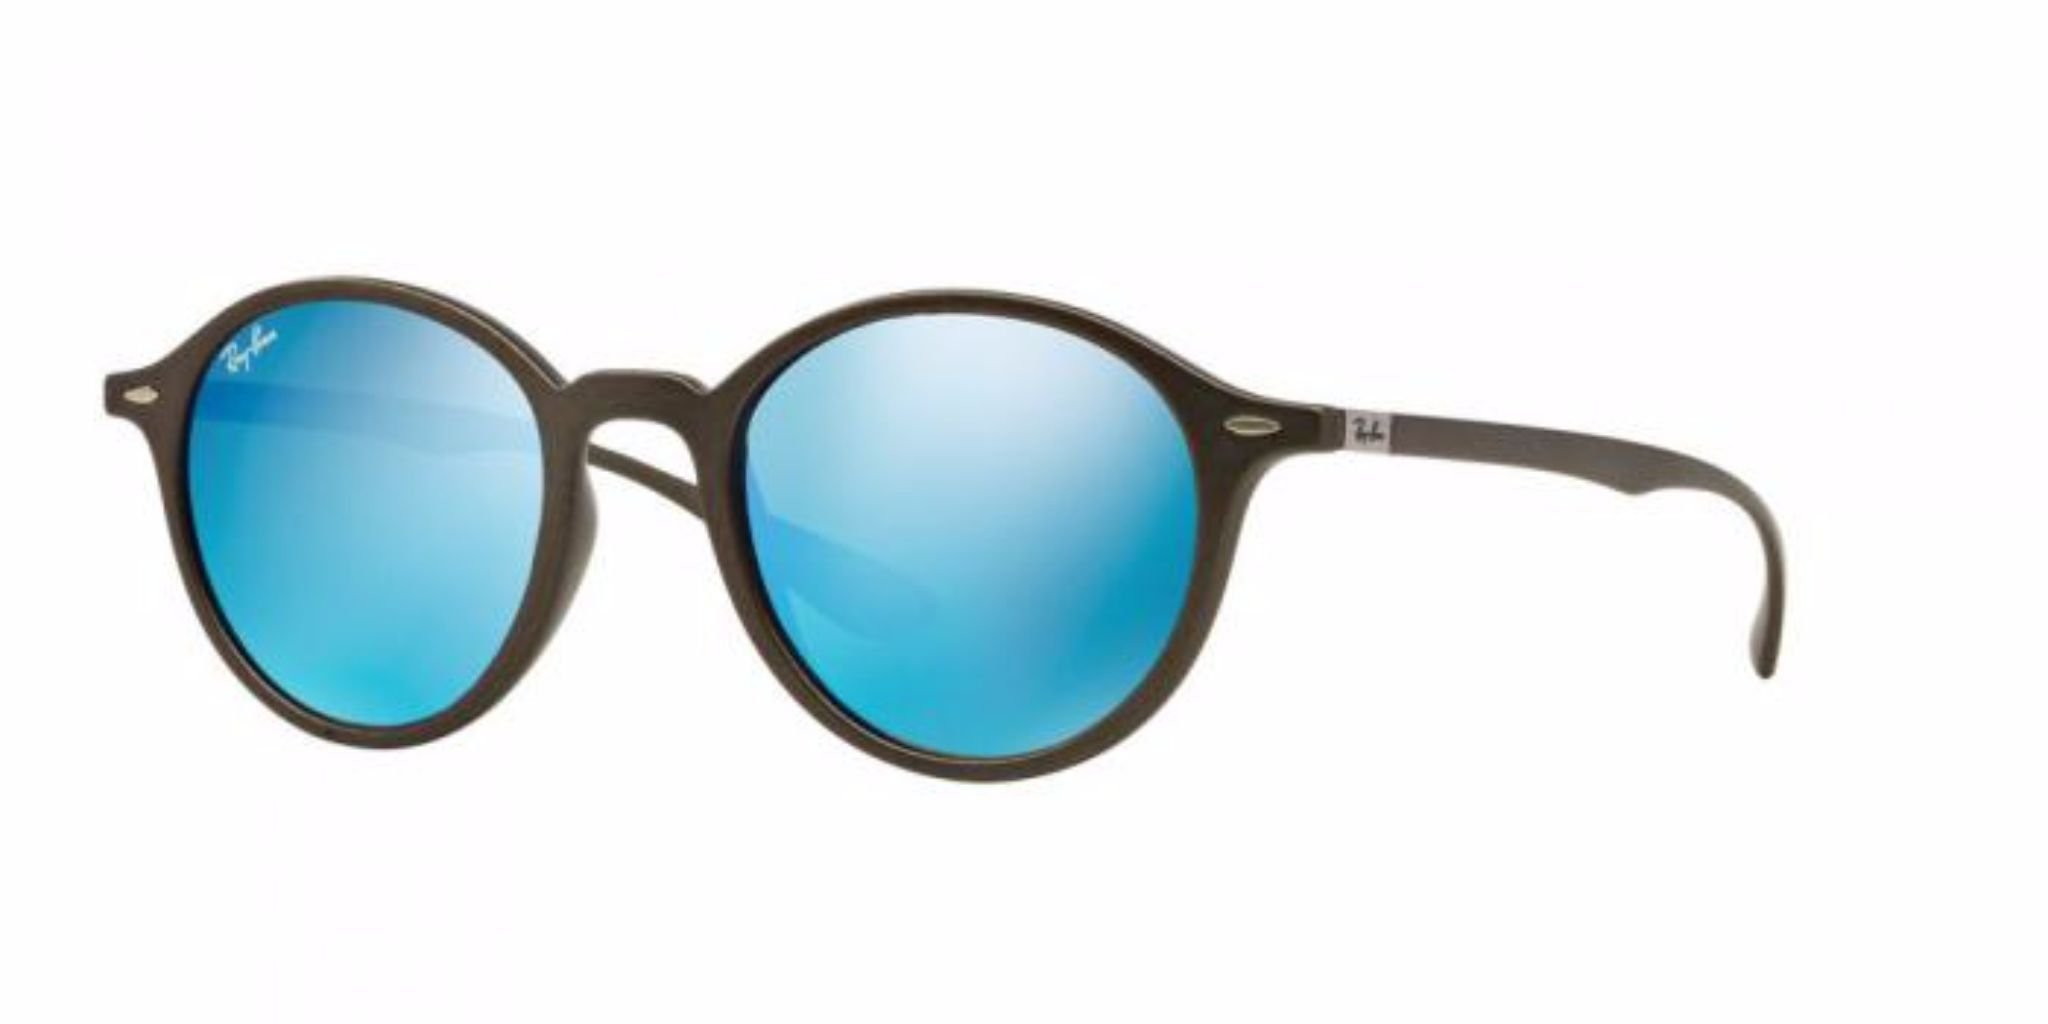 Ray-Ban INJECTED UNISEX SUNGLASS - MATTE DARK GREY Frame GREY MIRROR BLUE Lenses 50mm Non-Polarized